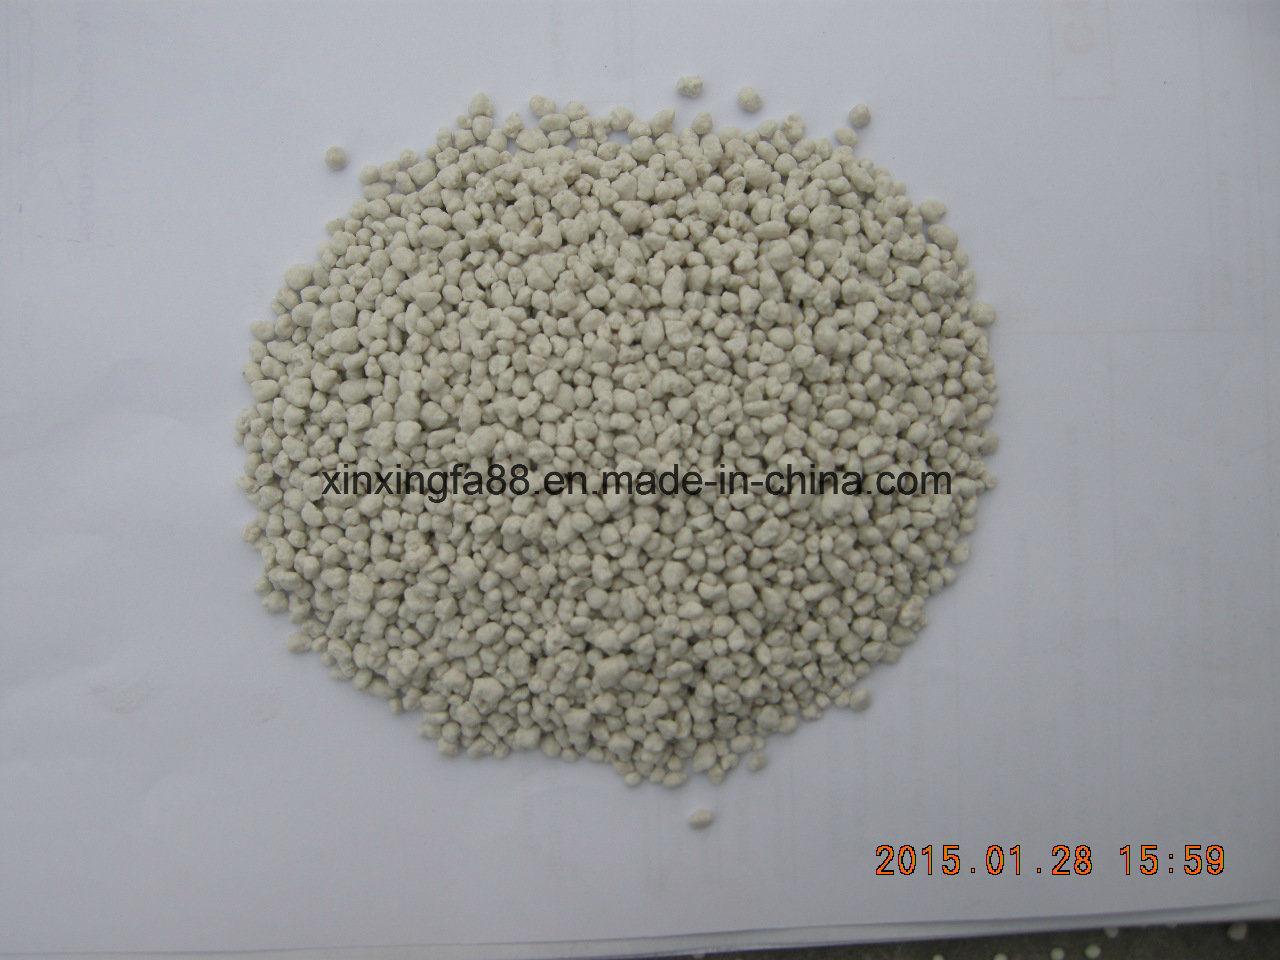 China NPK 18 - 18 - 18 Compound Fertilizer